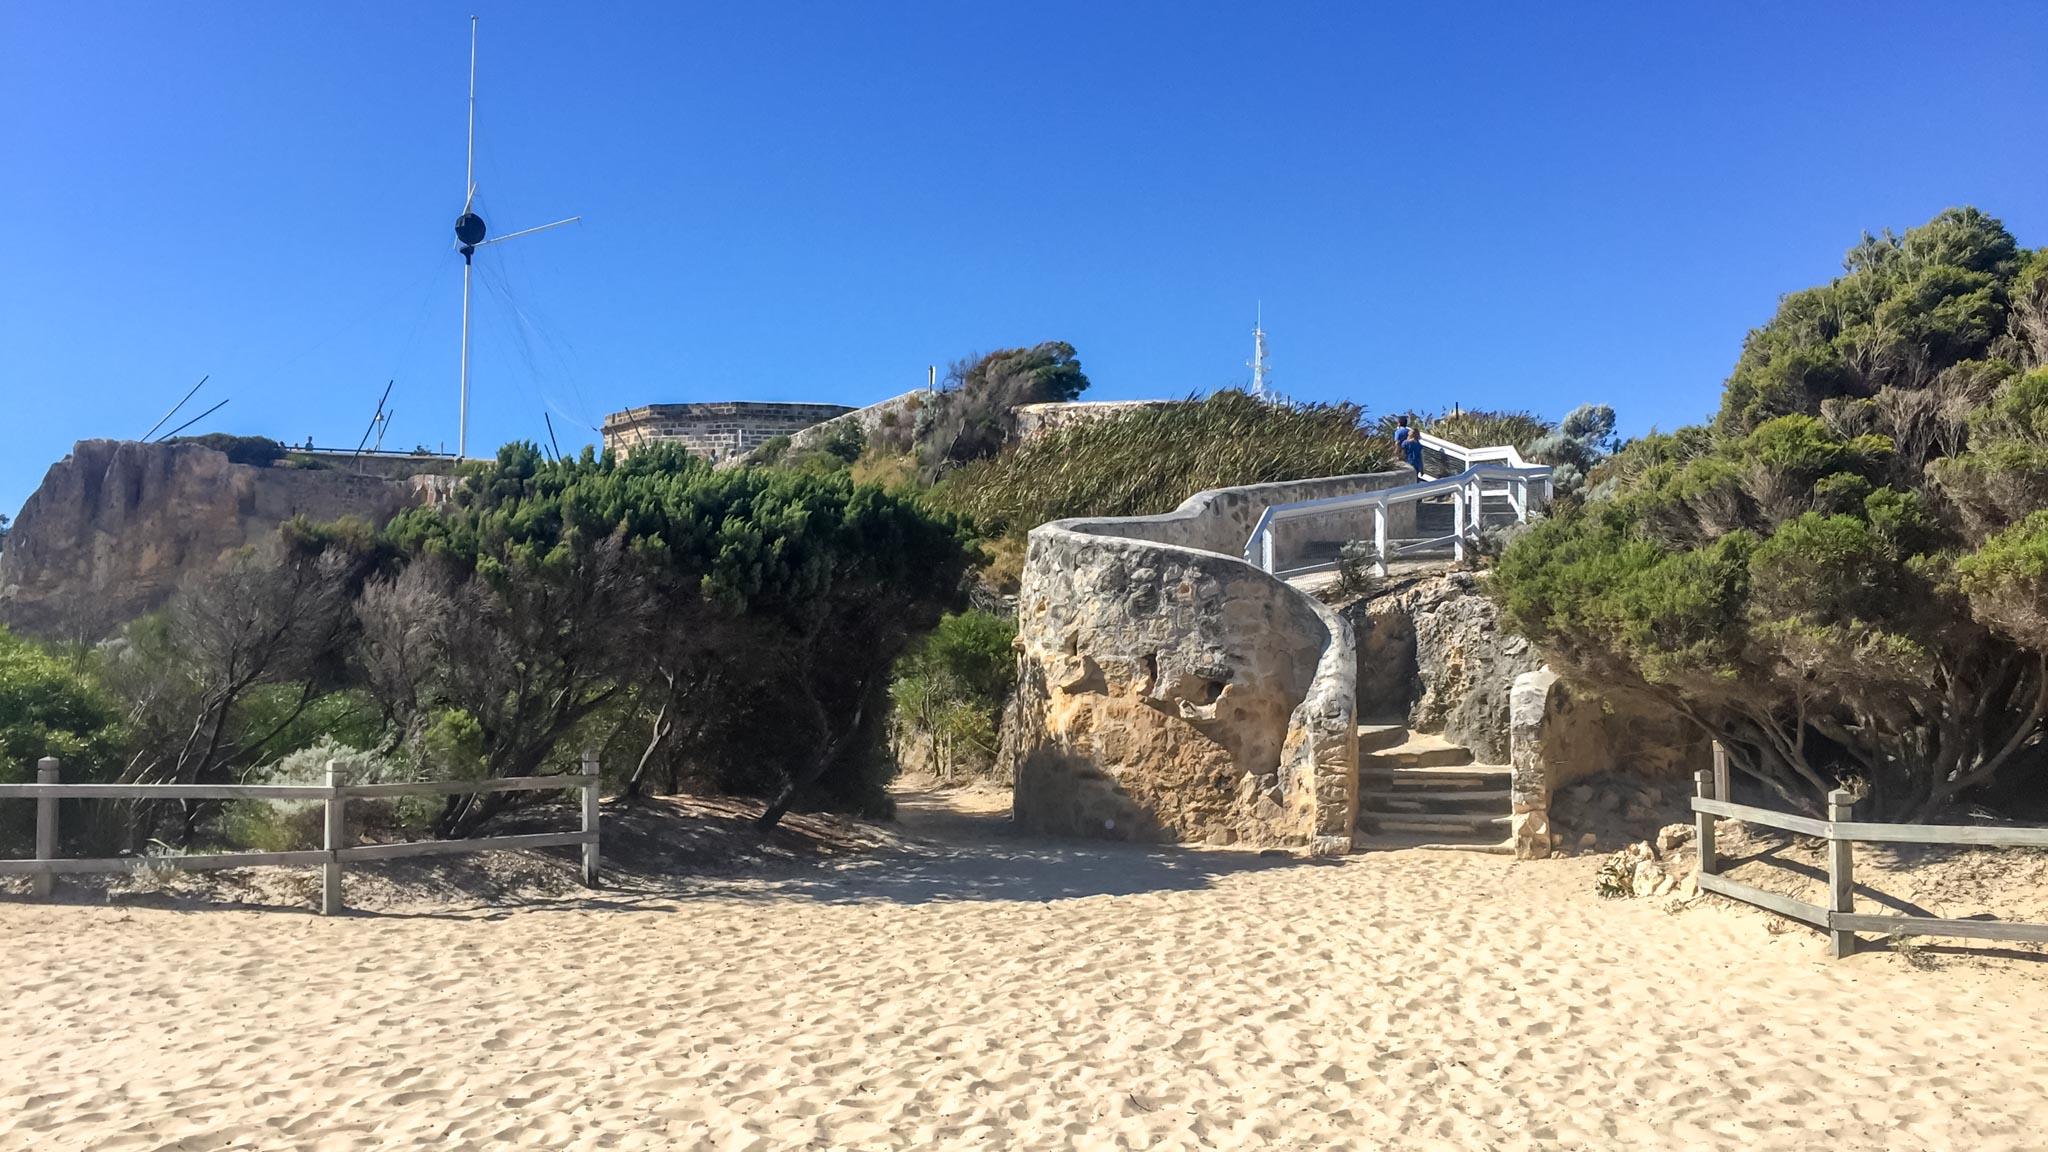 Beaches in Fremantle